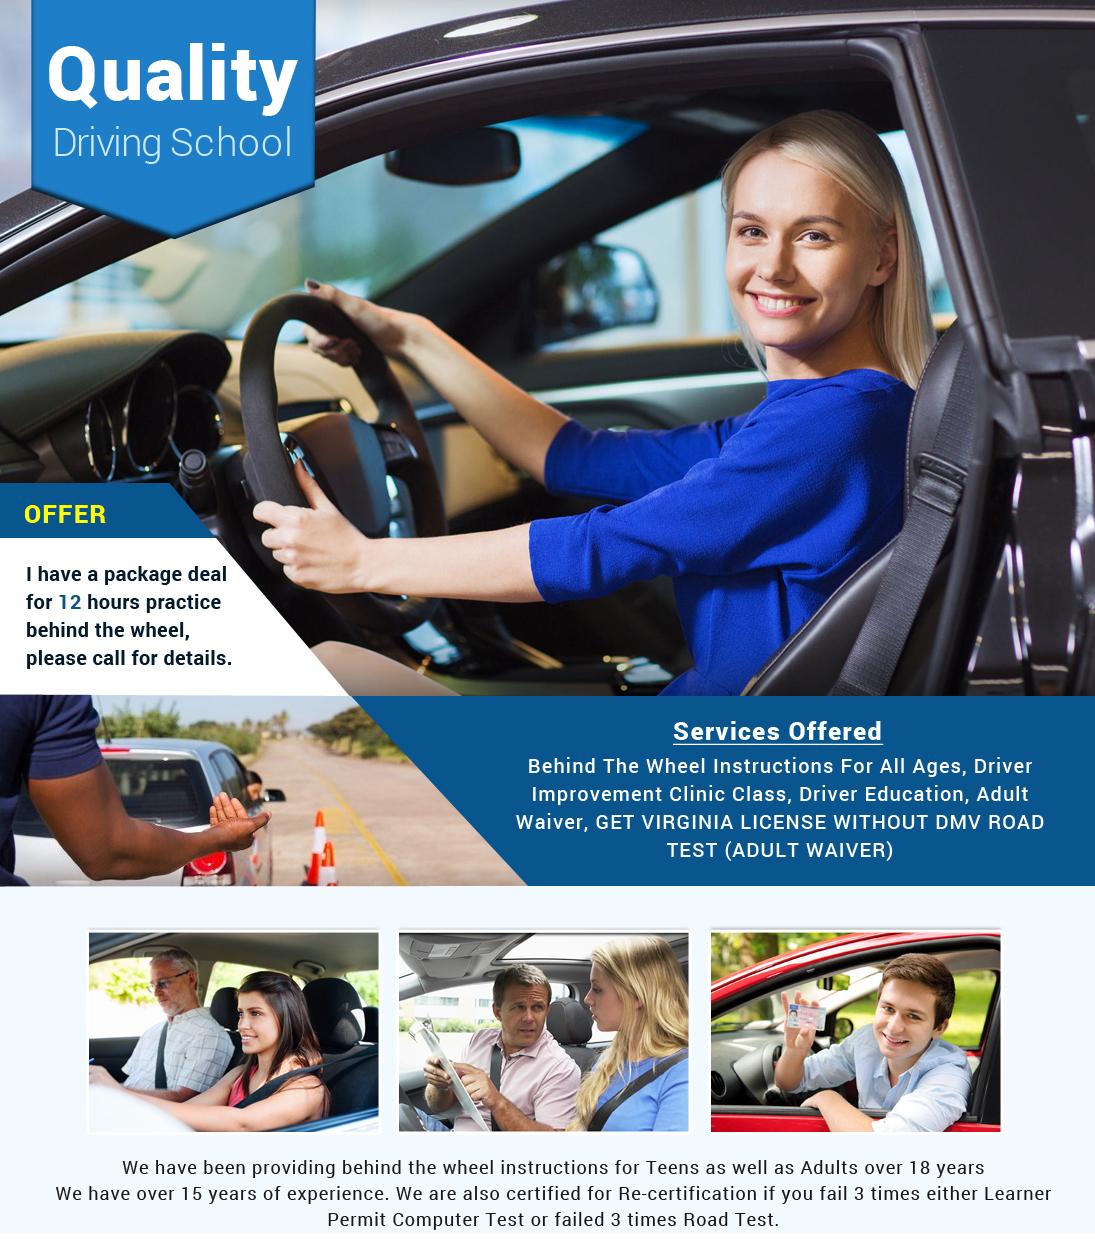 Quality Driving School - Driving School - Fairfax, VA | Sulekha